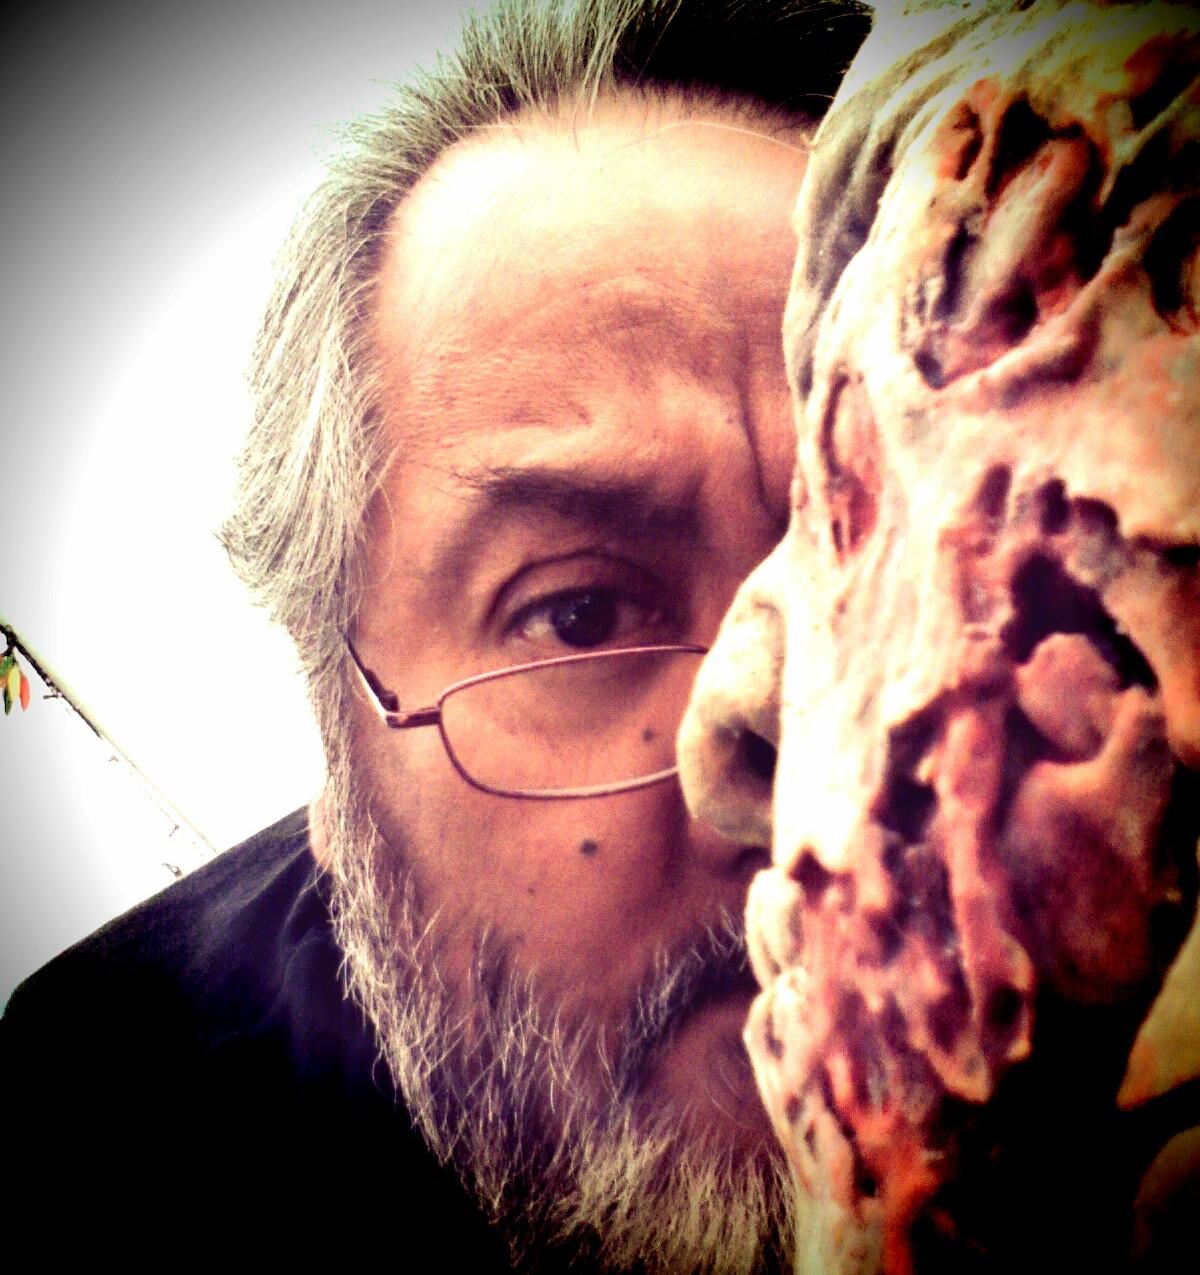 Rick and mask